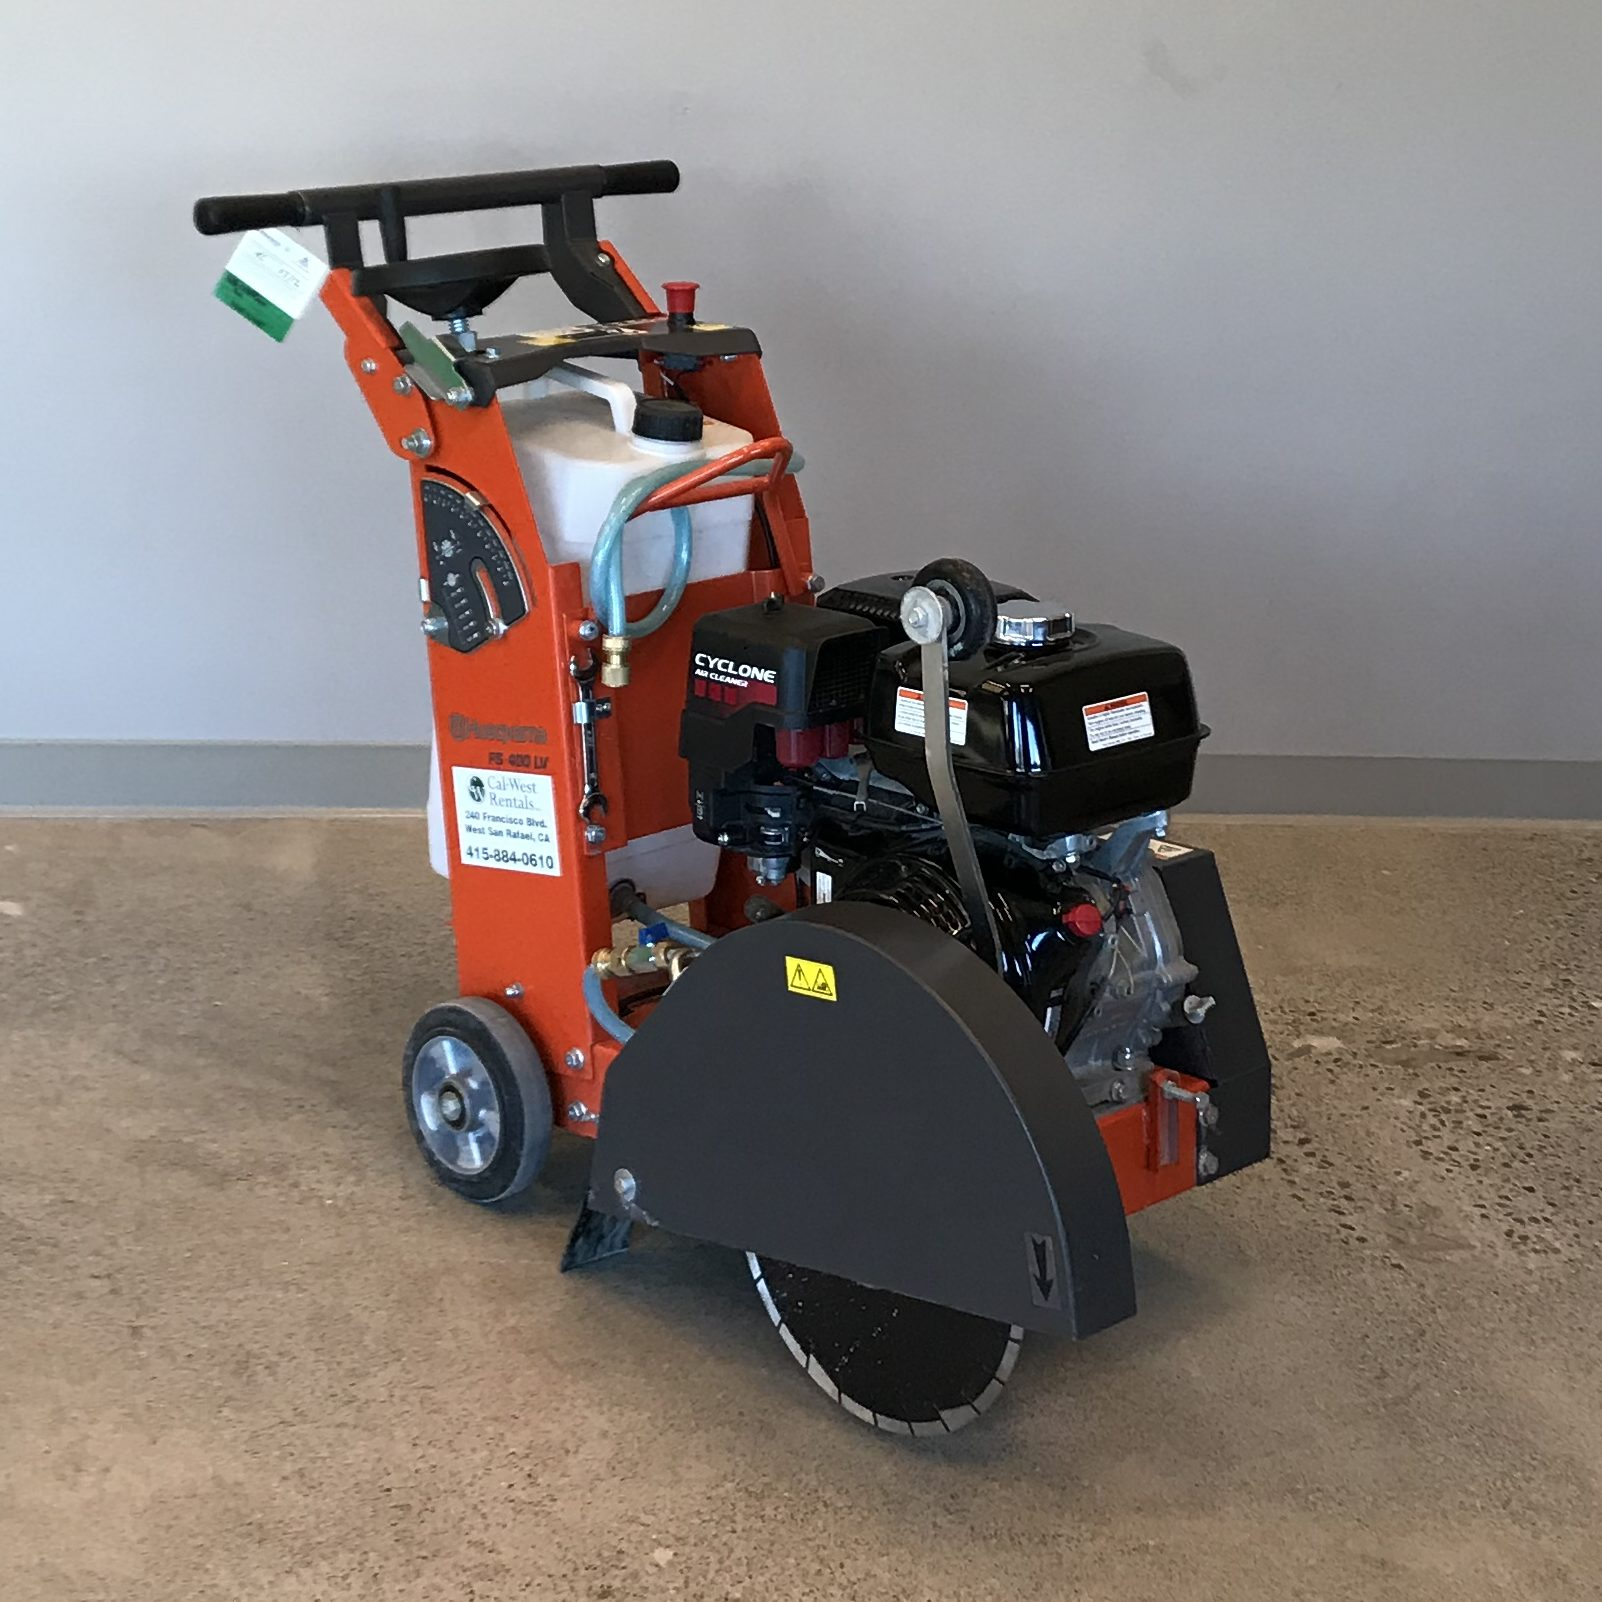 Husqvarna-Concrete-Saw-Walkbehind-FS400LV